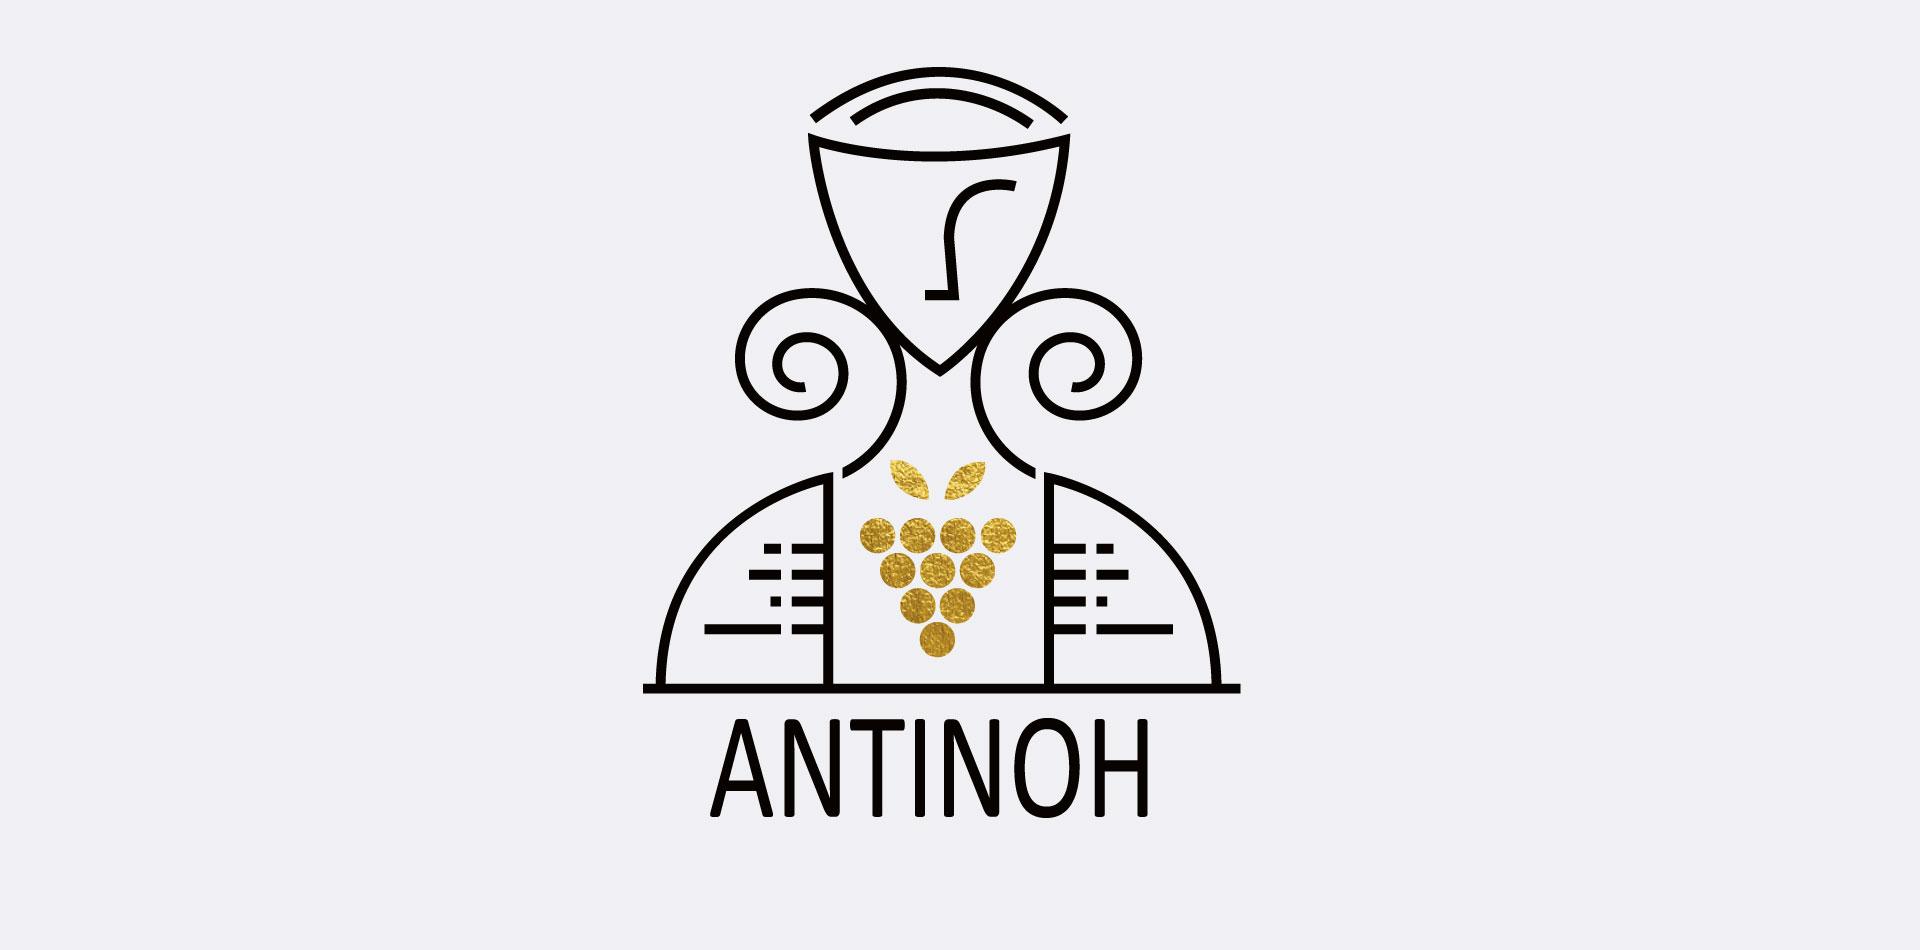 antinoe logo